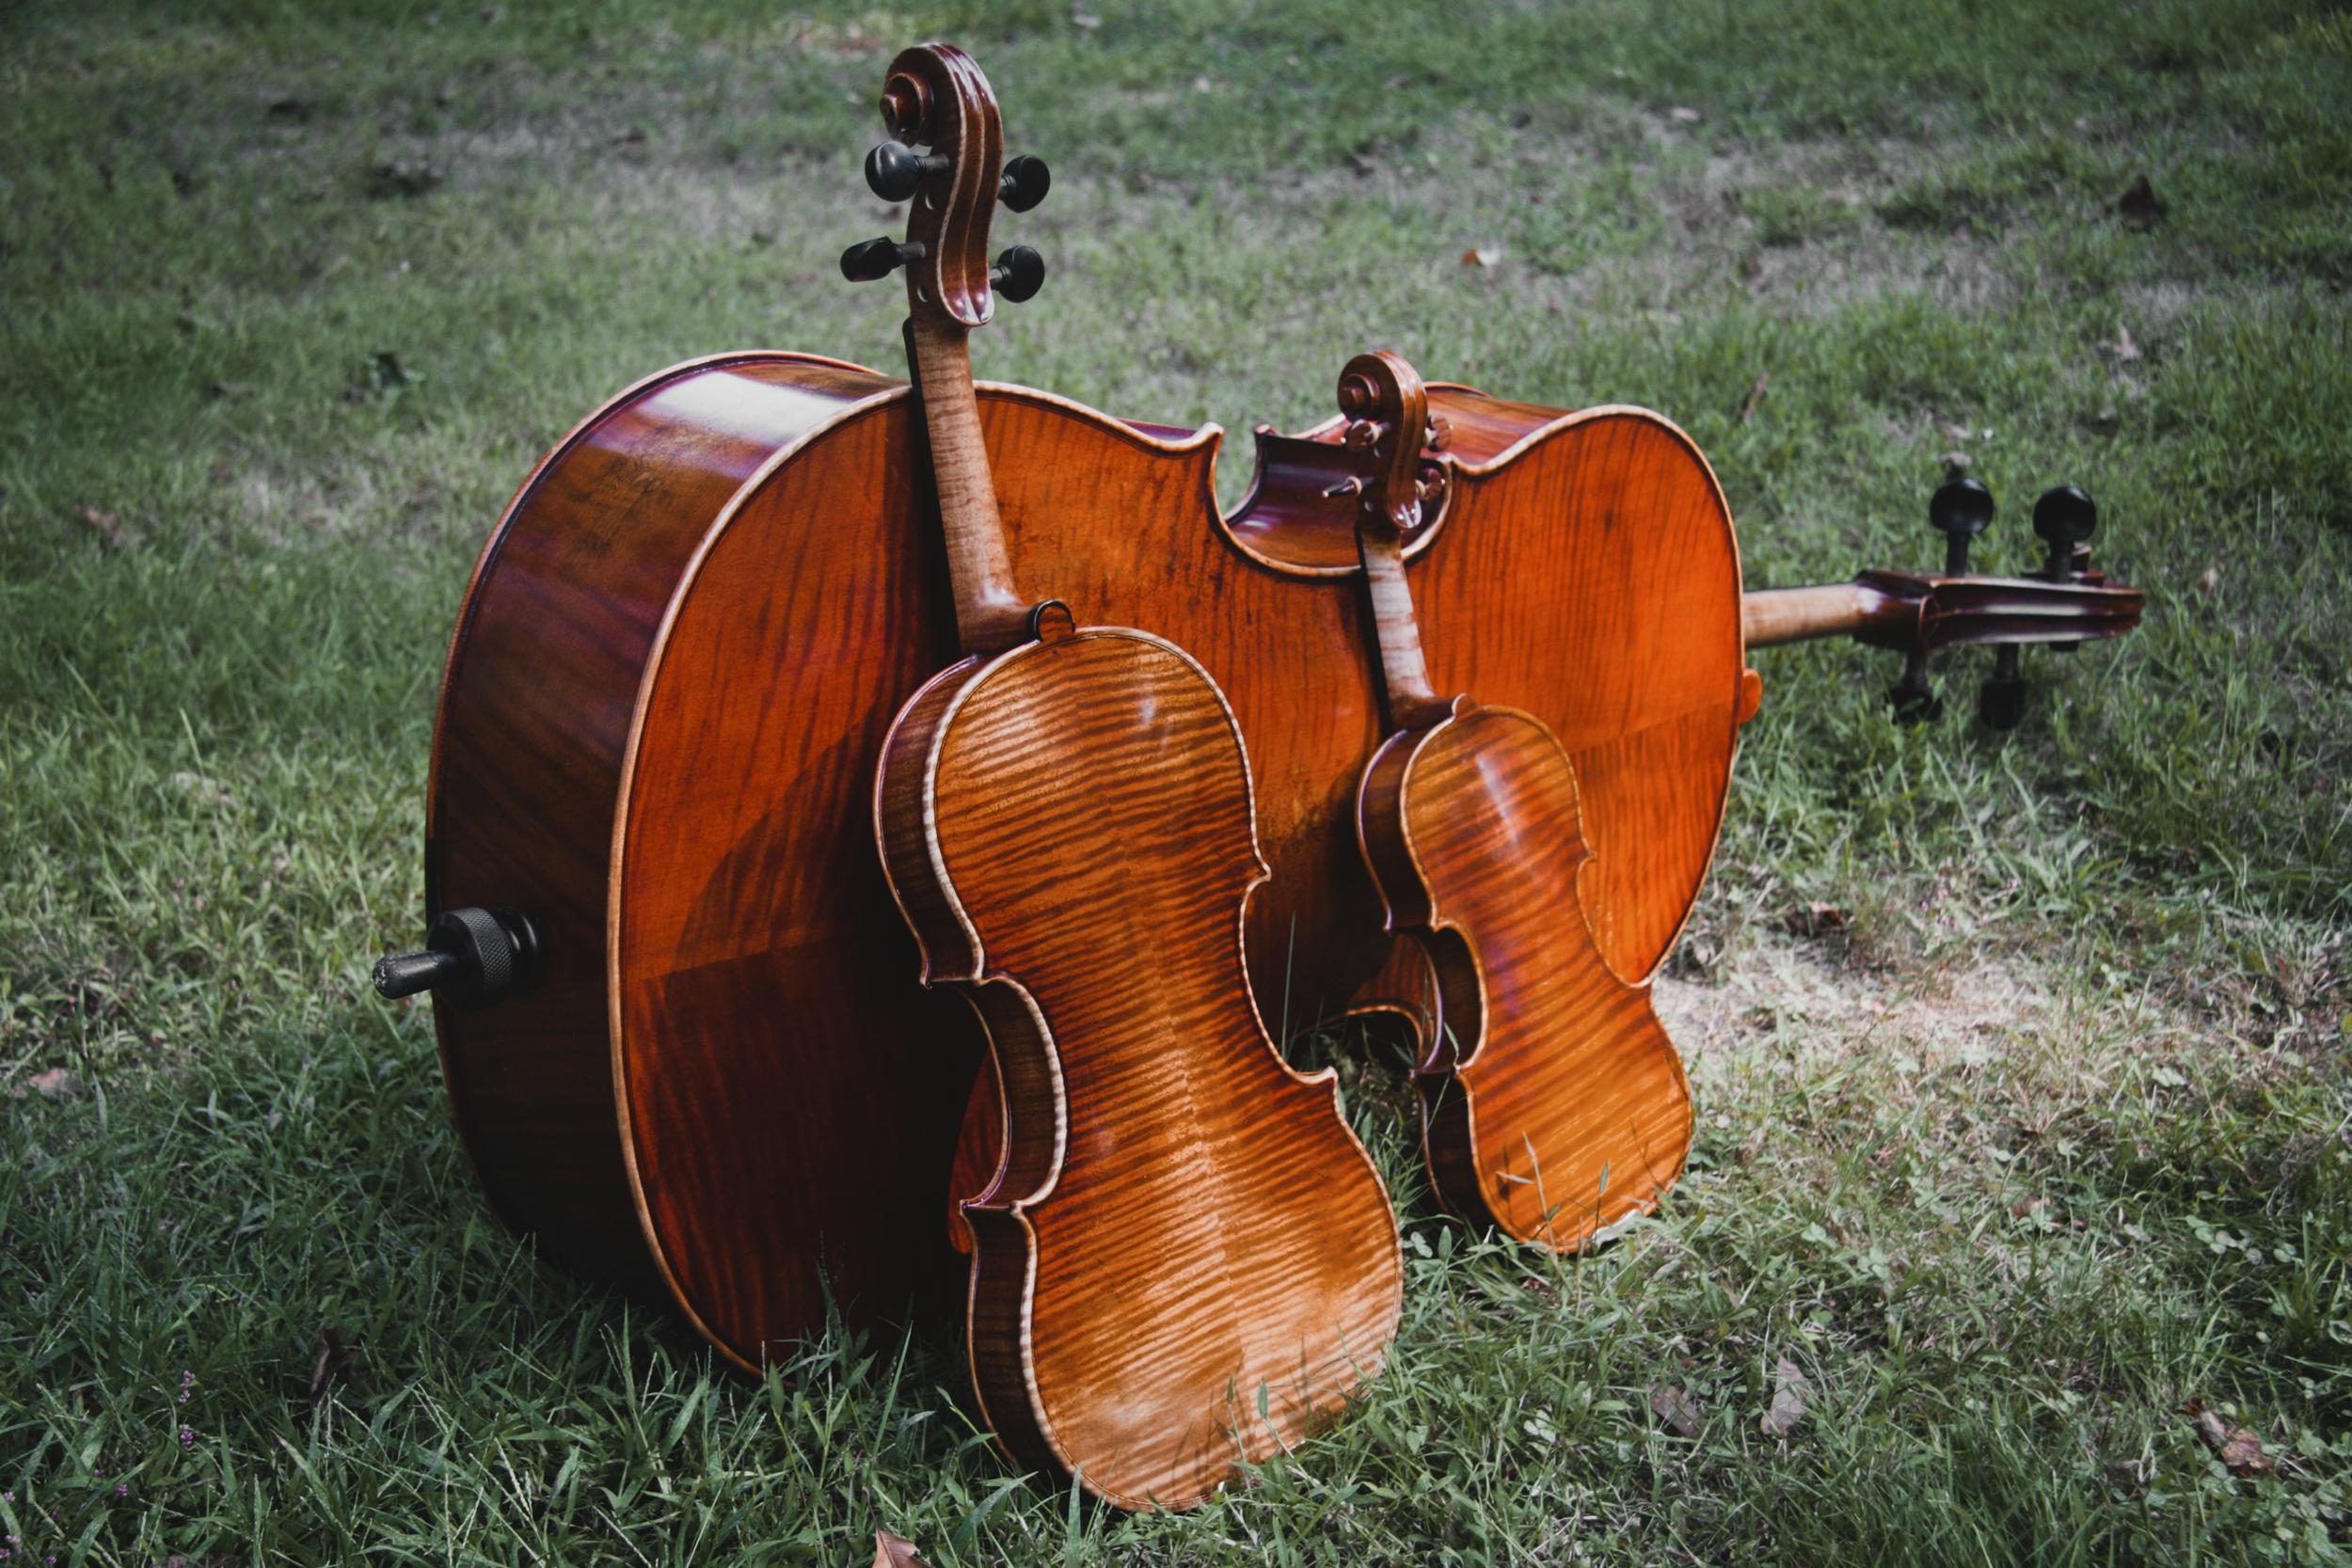 Cello_Violins_Grass.jpg